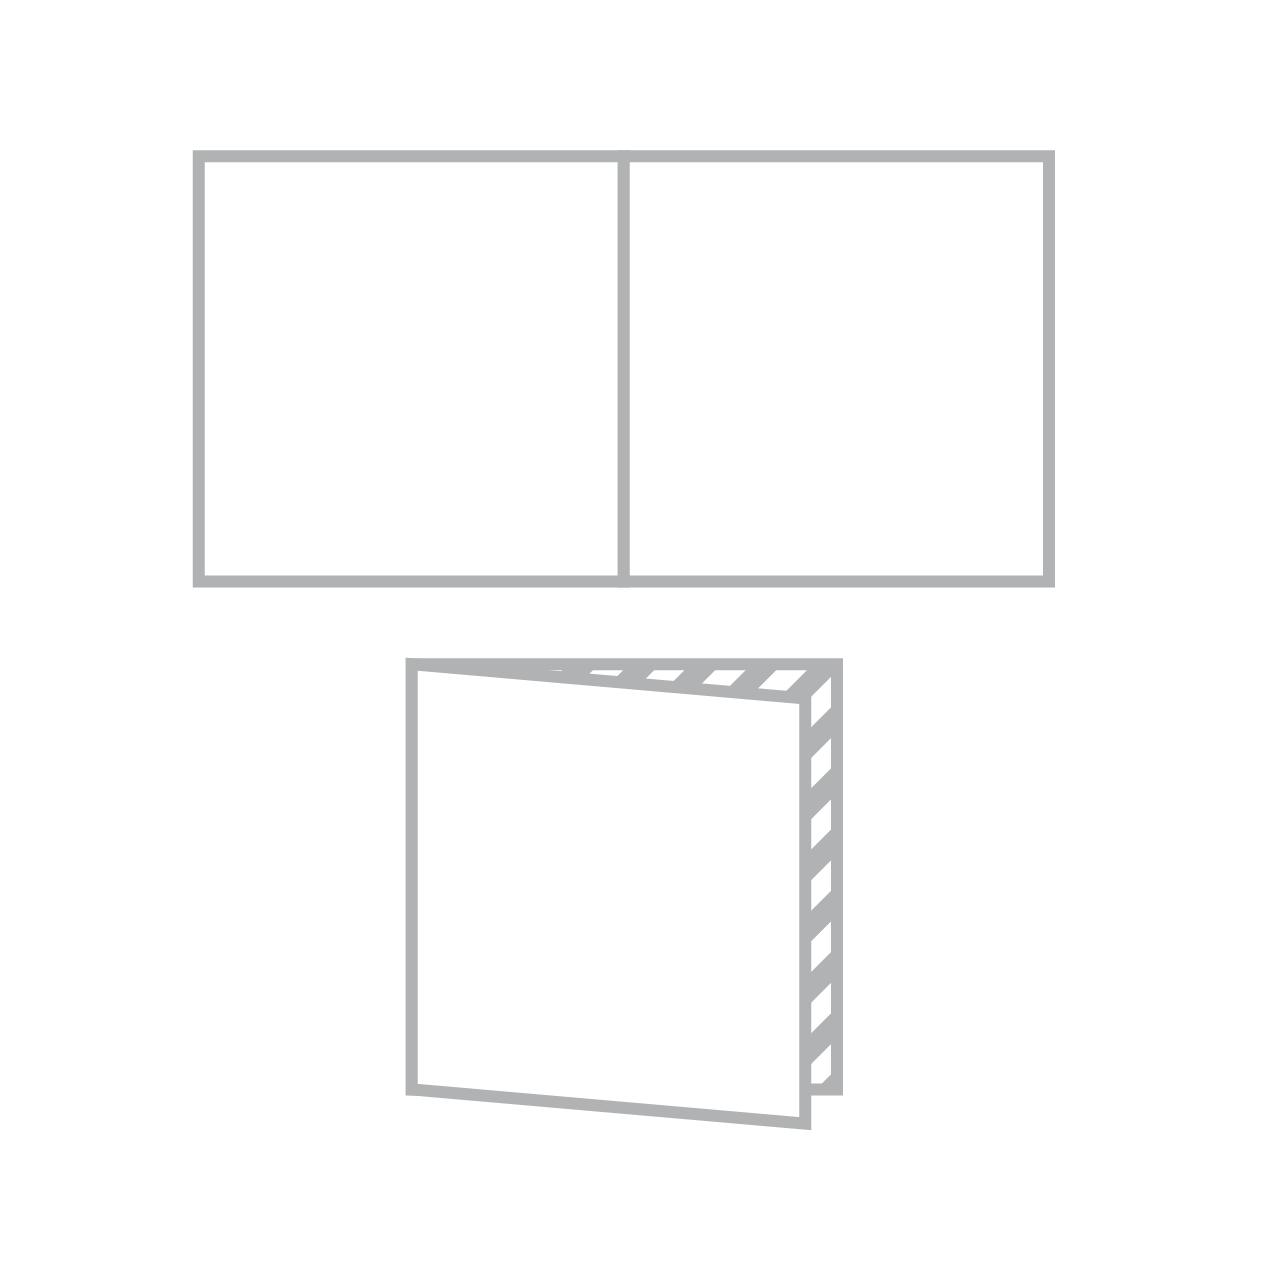 Illustrationen_Karten_Klappkarte_Quadratisch_RF